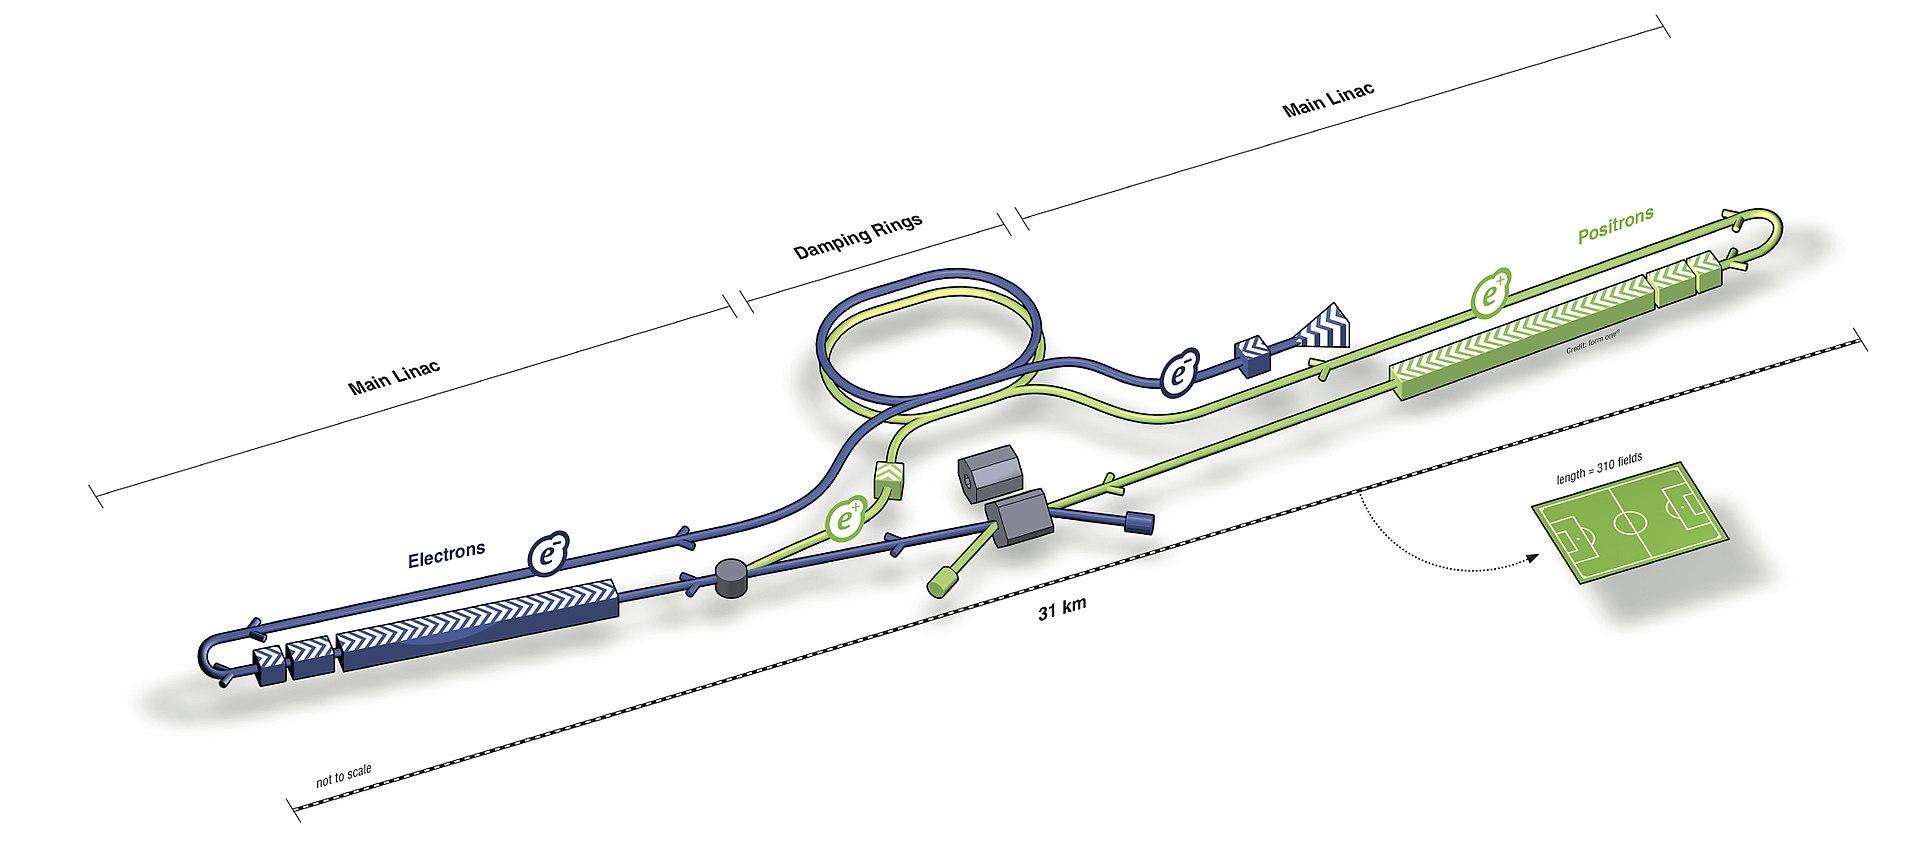 International Linear Collider {image source: wikipedia}